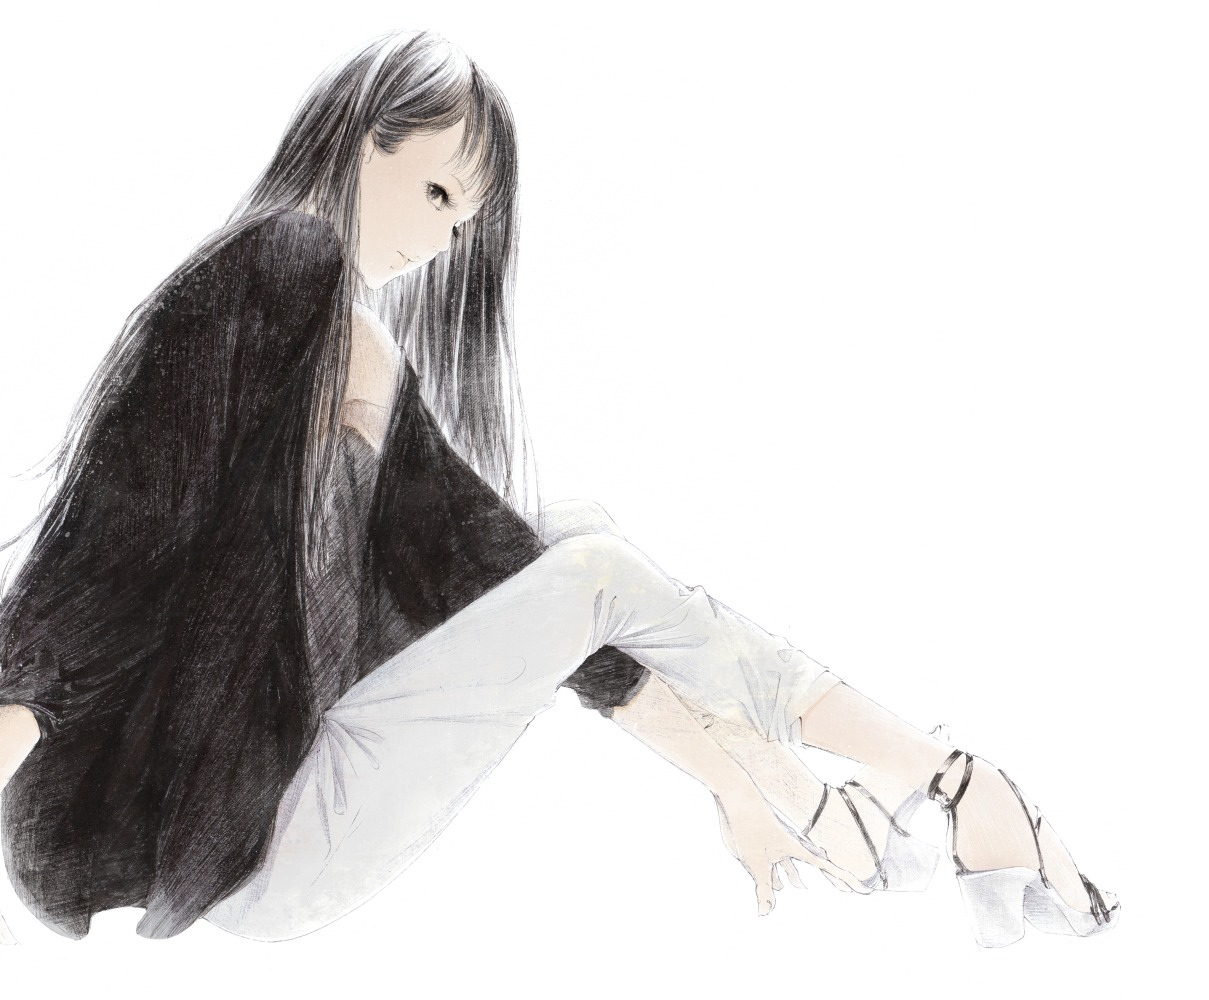 http://static.zerochan.net/Sawasawa.full.1475345.jpg